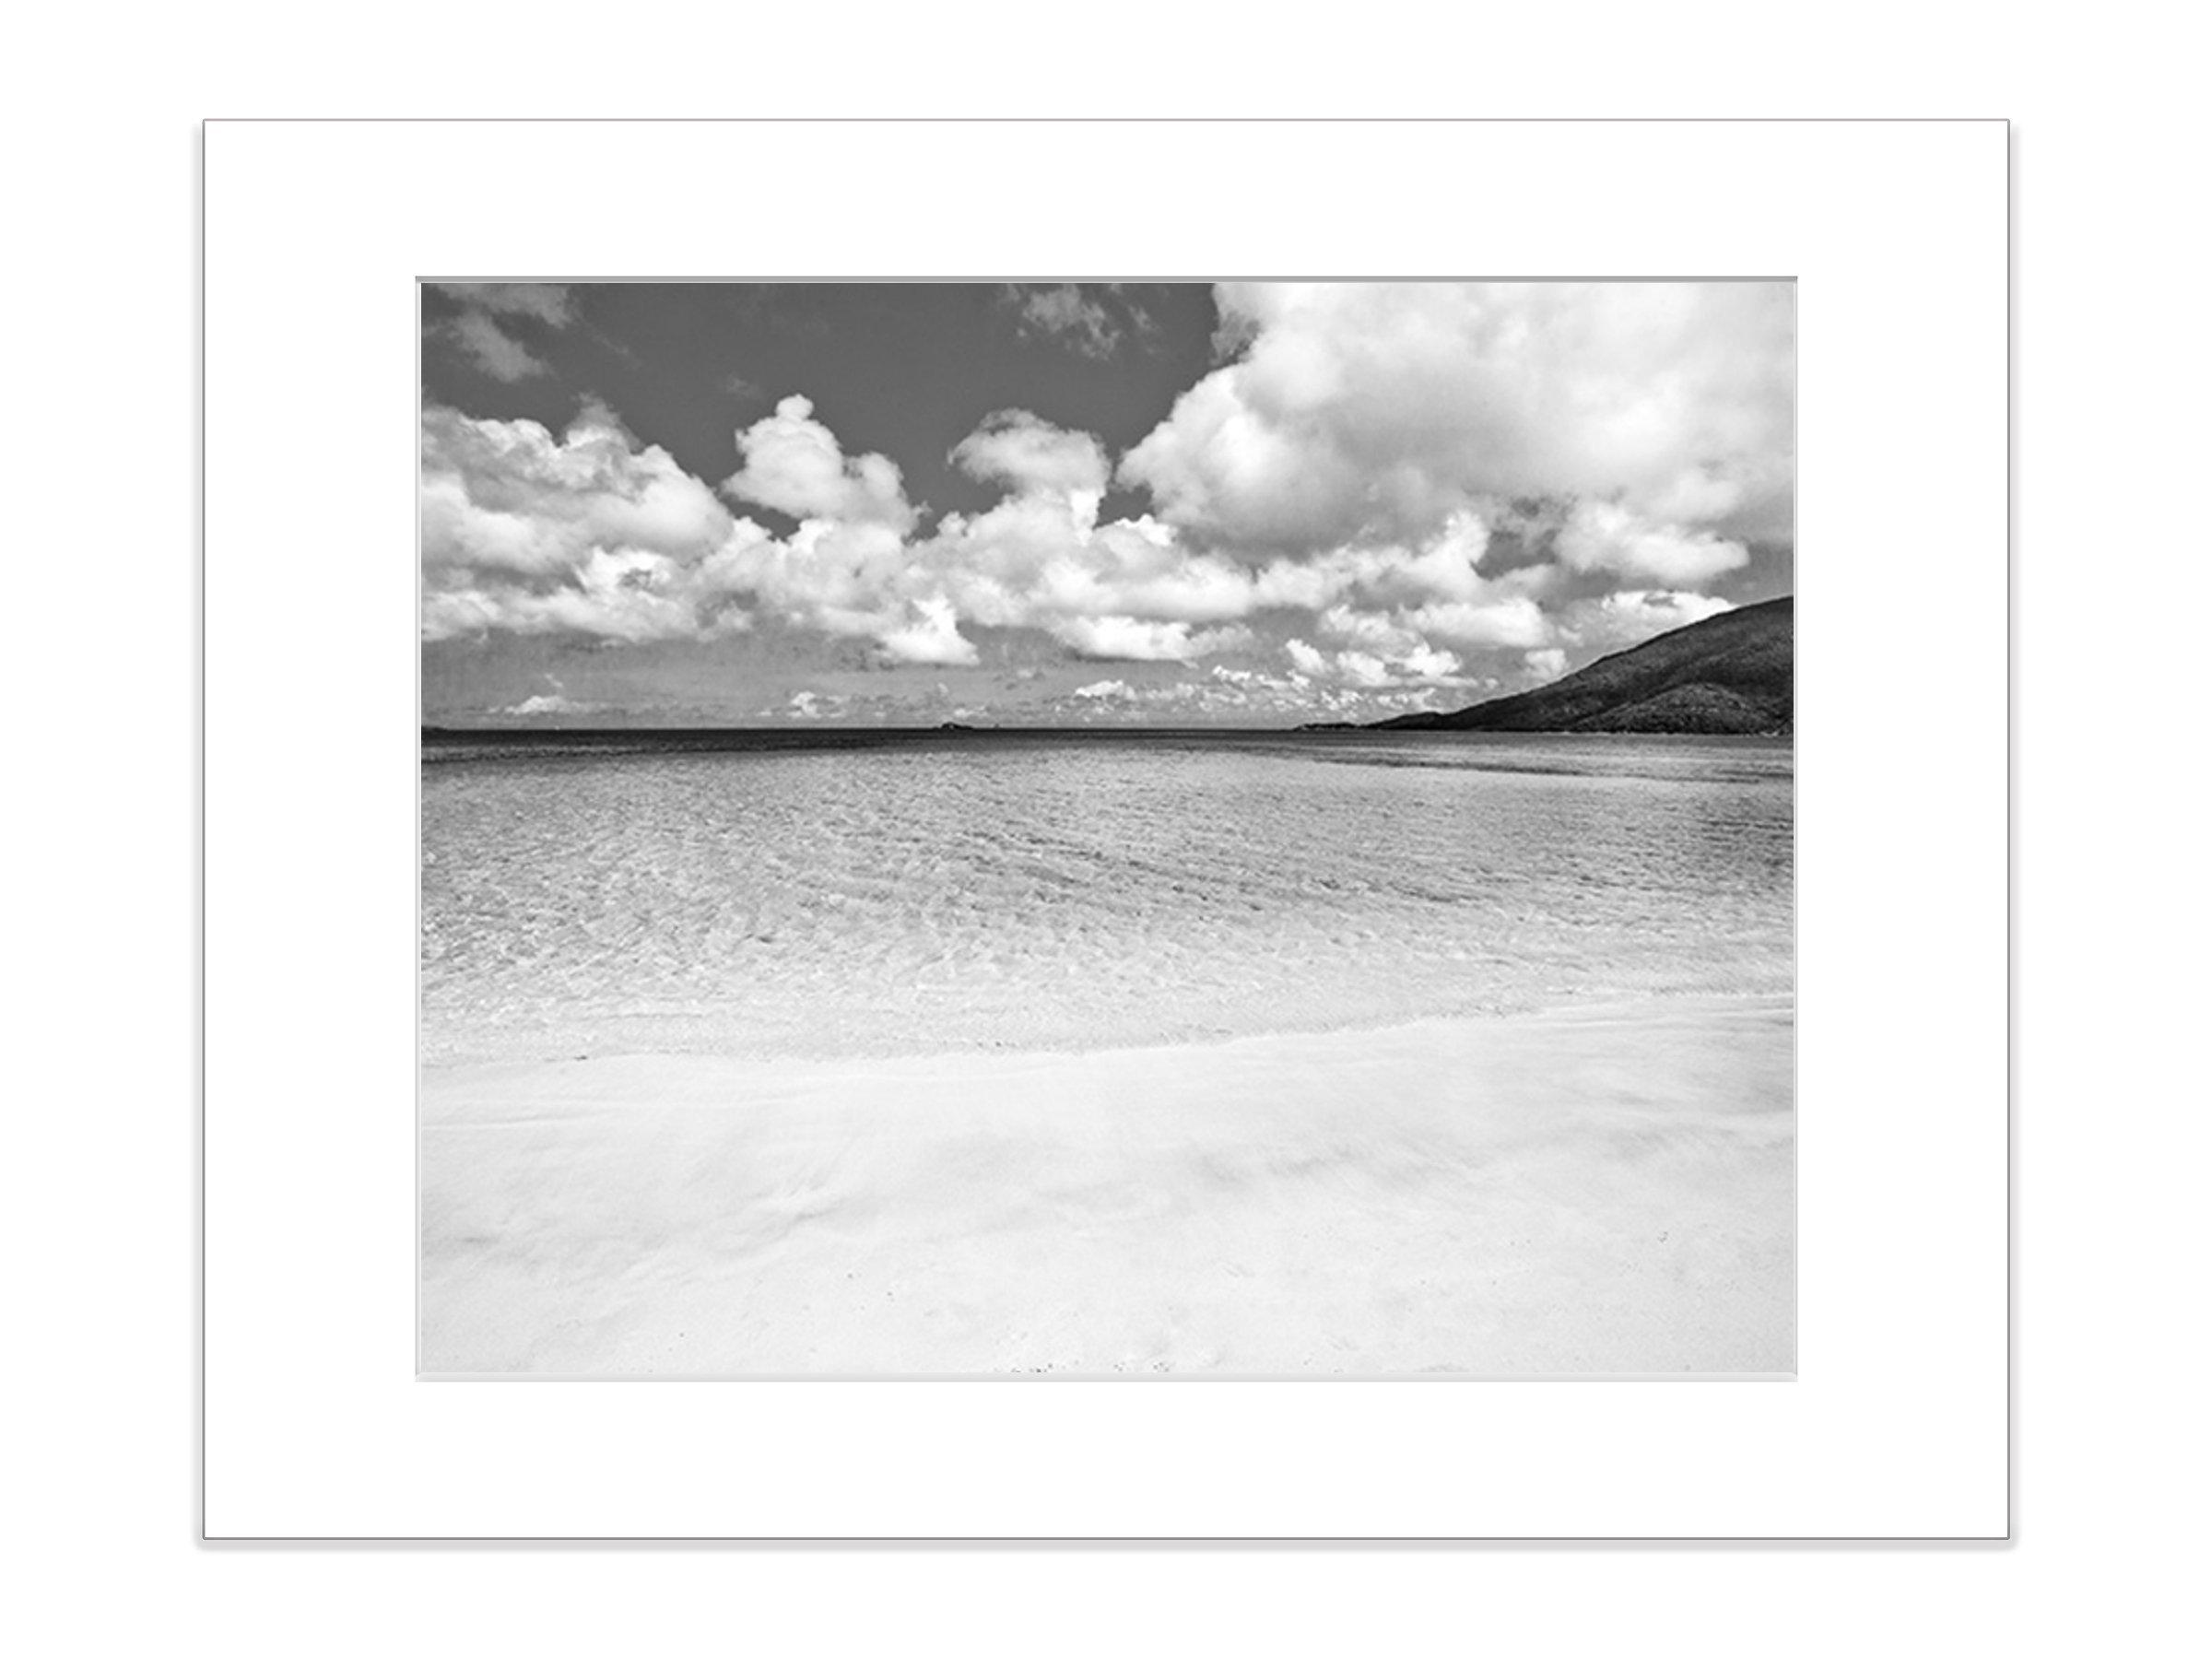 Black and White Beach Photography Coastal Island Art 5x7 Inch Matted Print